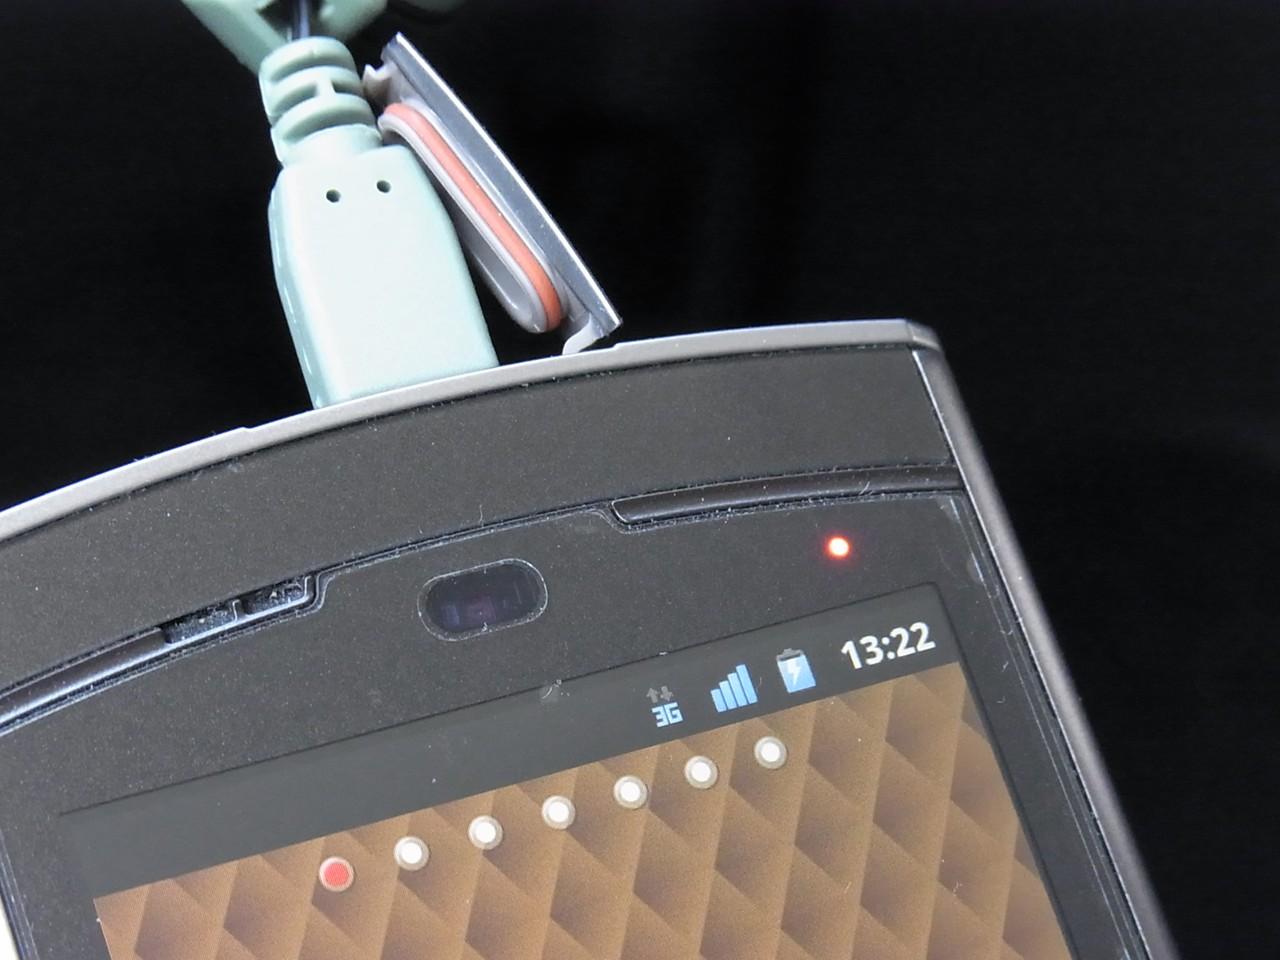 N-06Cに差し込んでみた。スマートフォンを充電できる。これが本来の使い方